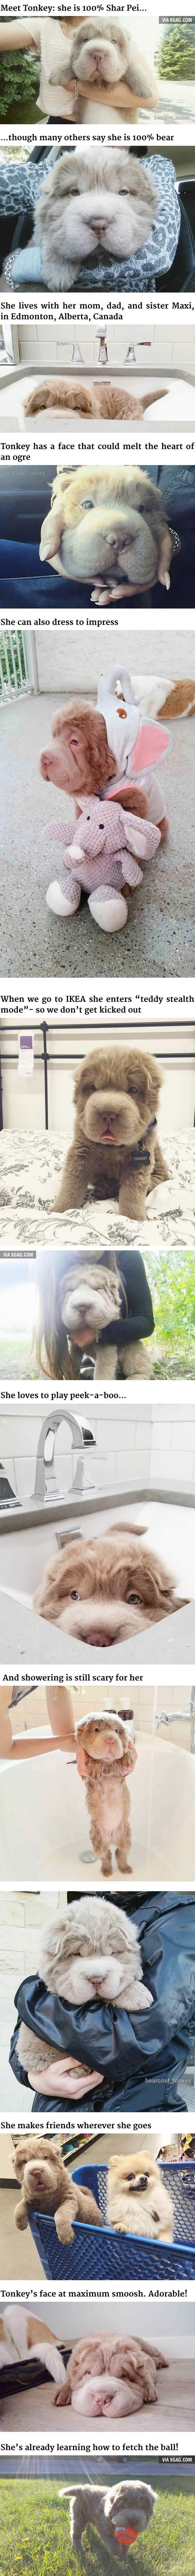 best dogs psíkovia images on pinterest beautiful dogs